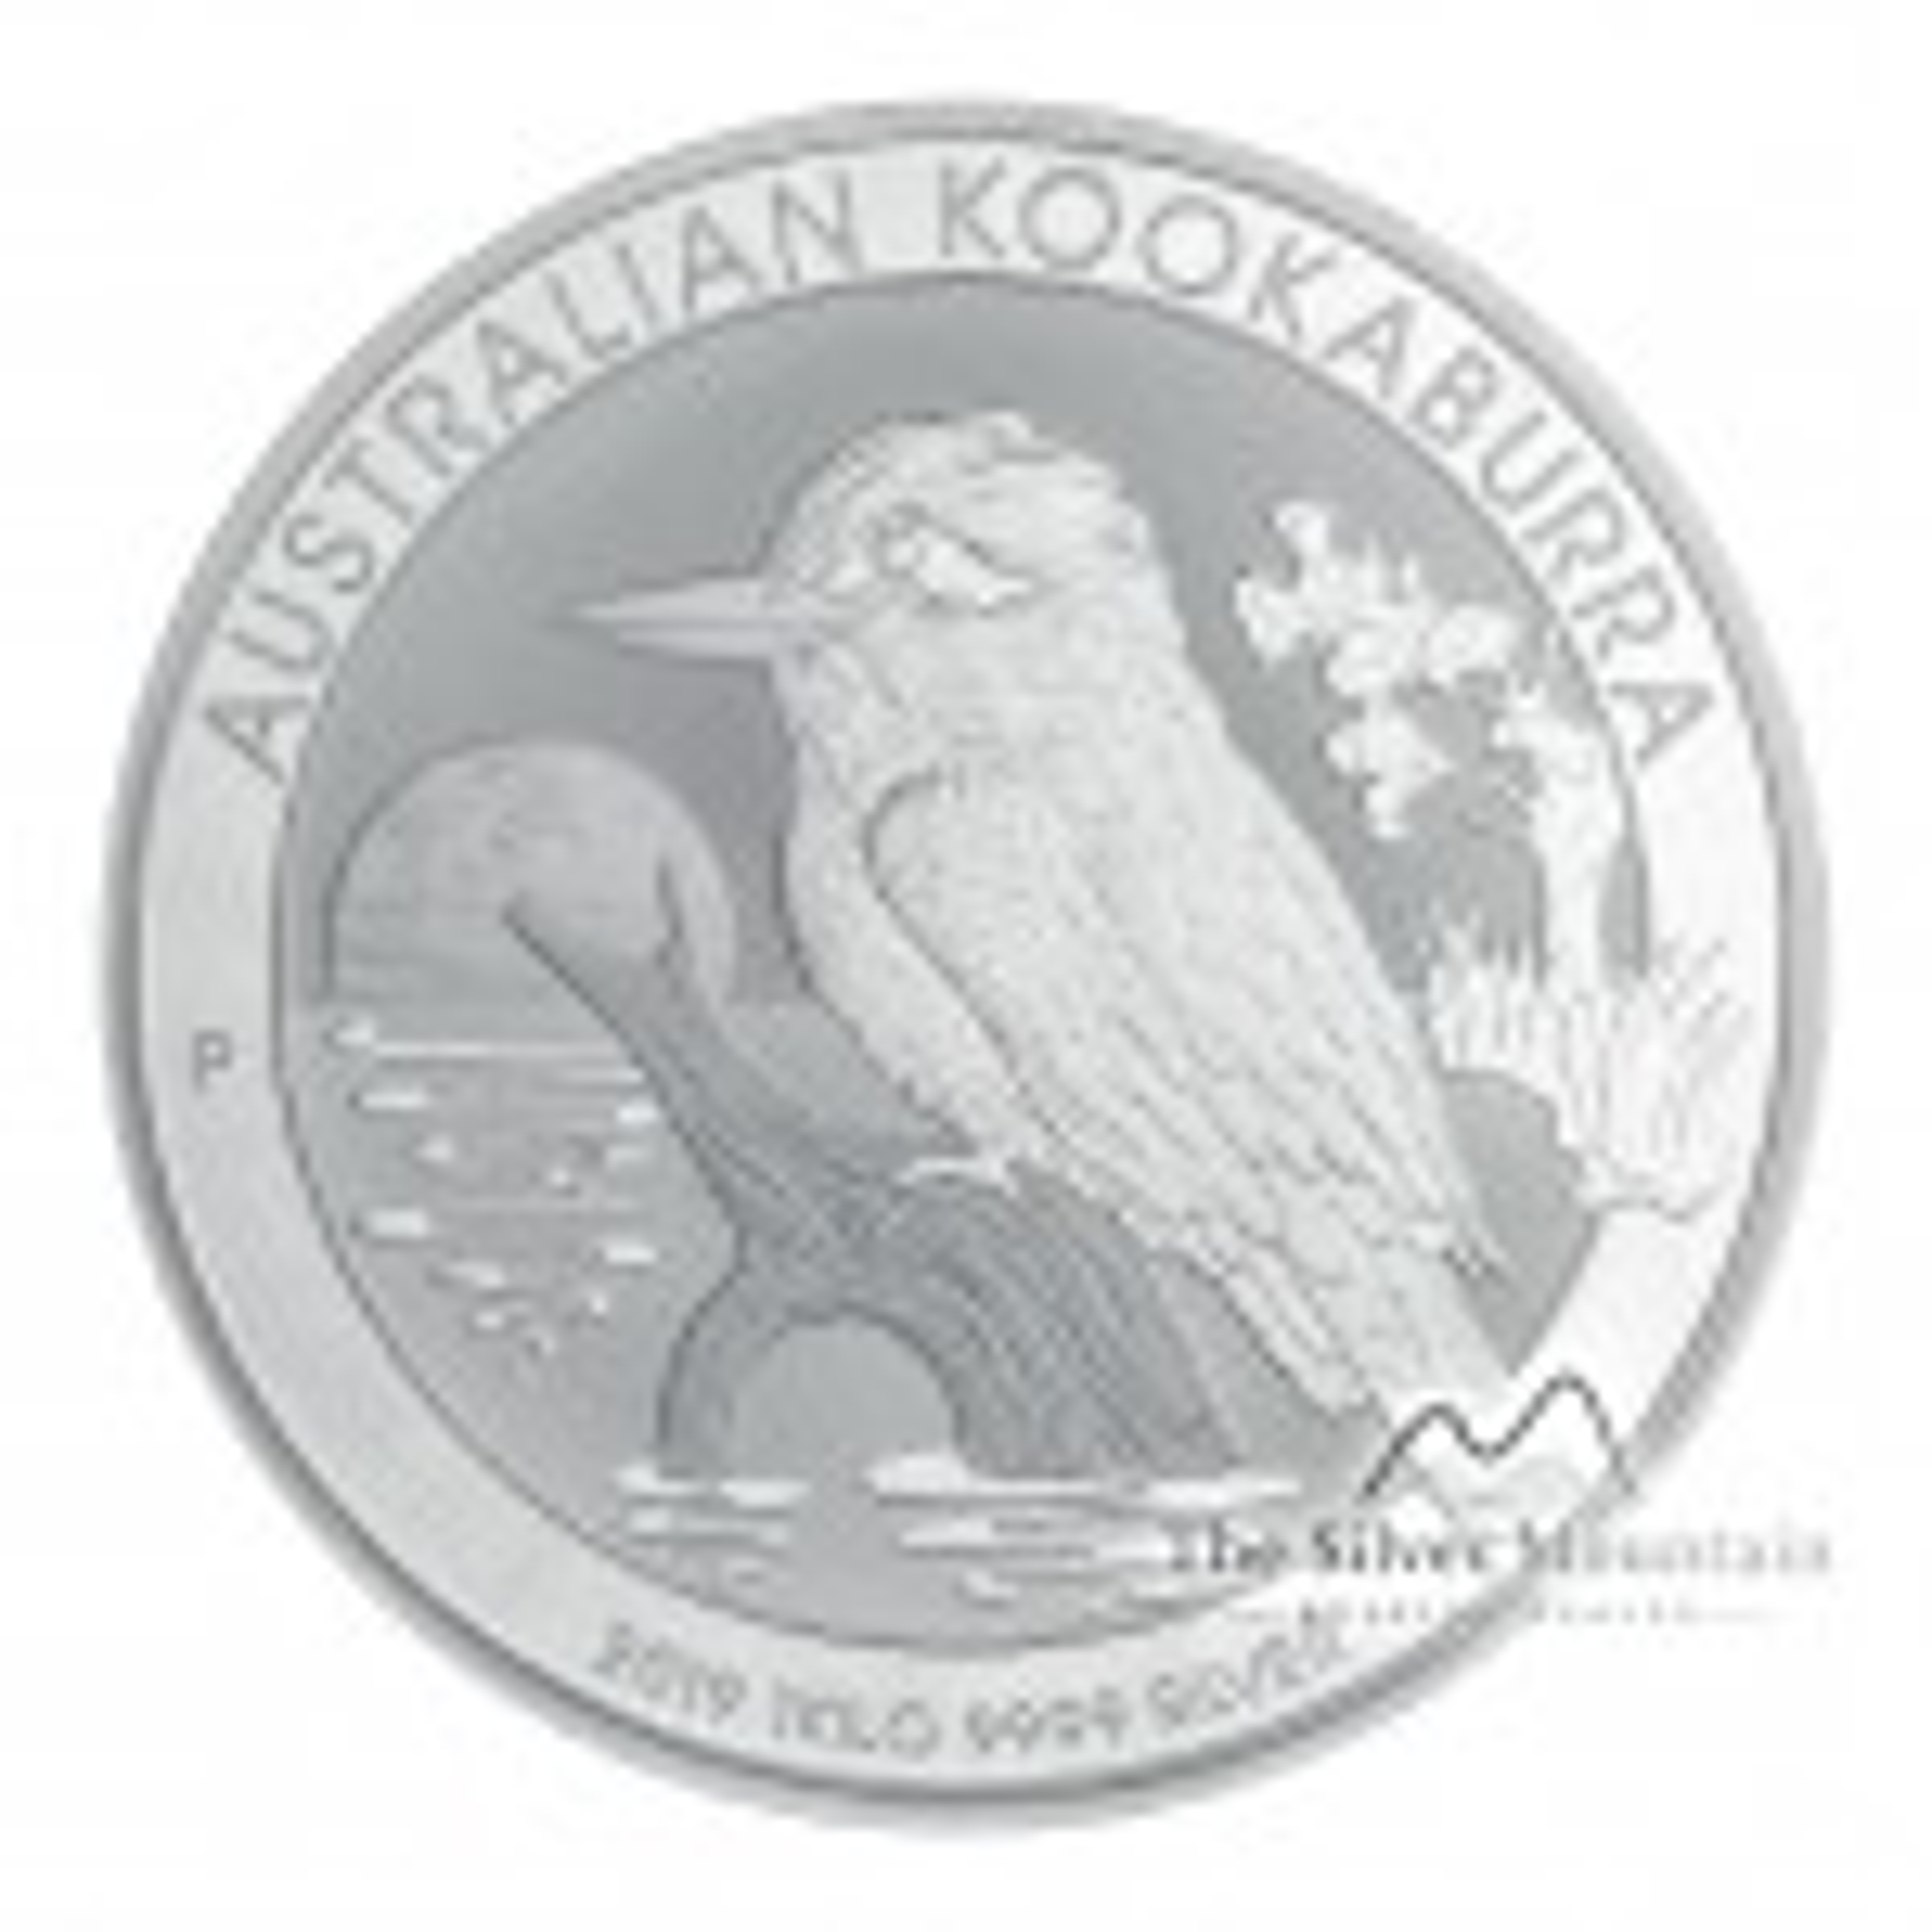 1 Kilogram silver coin Kookaburra 2019